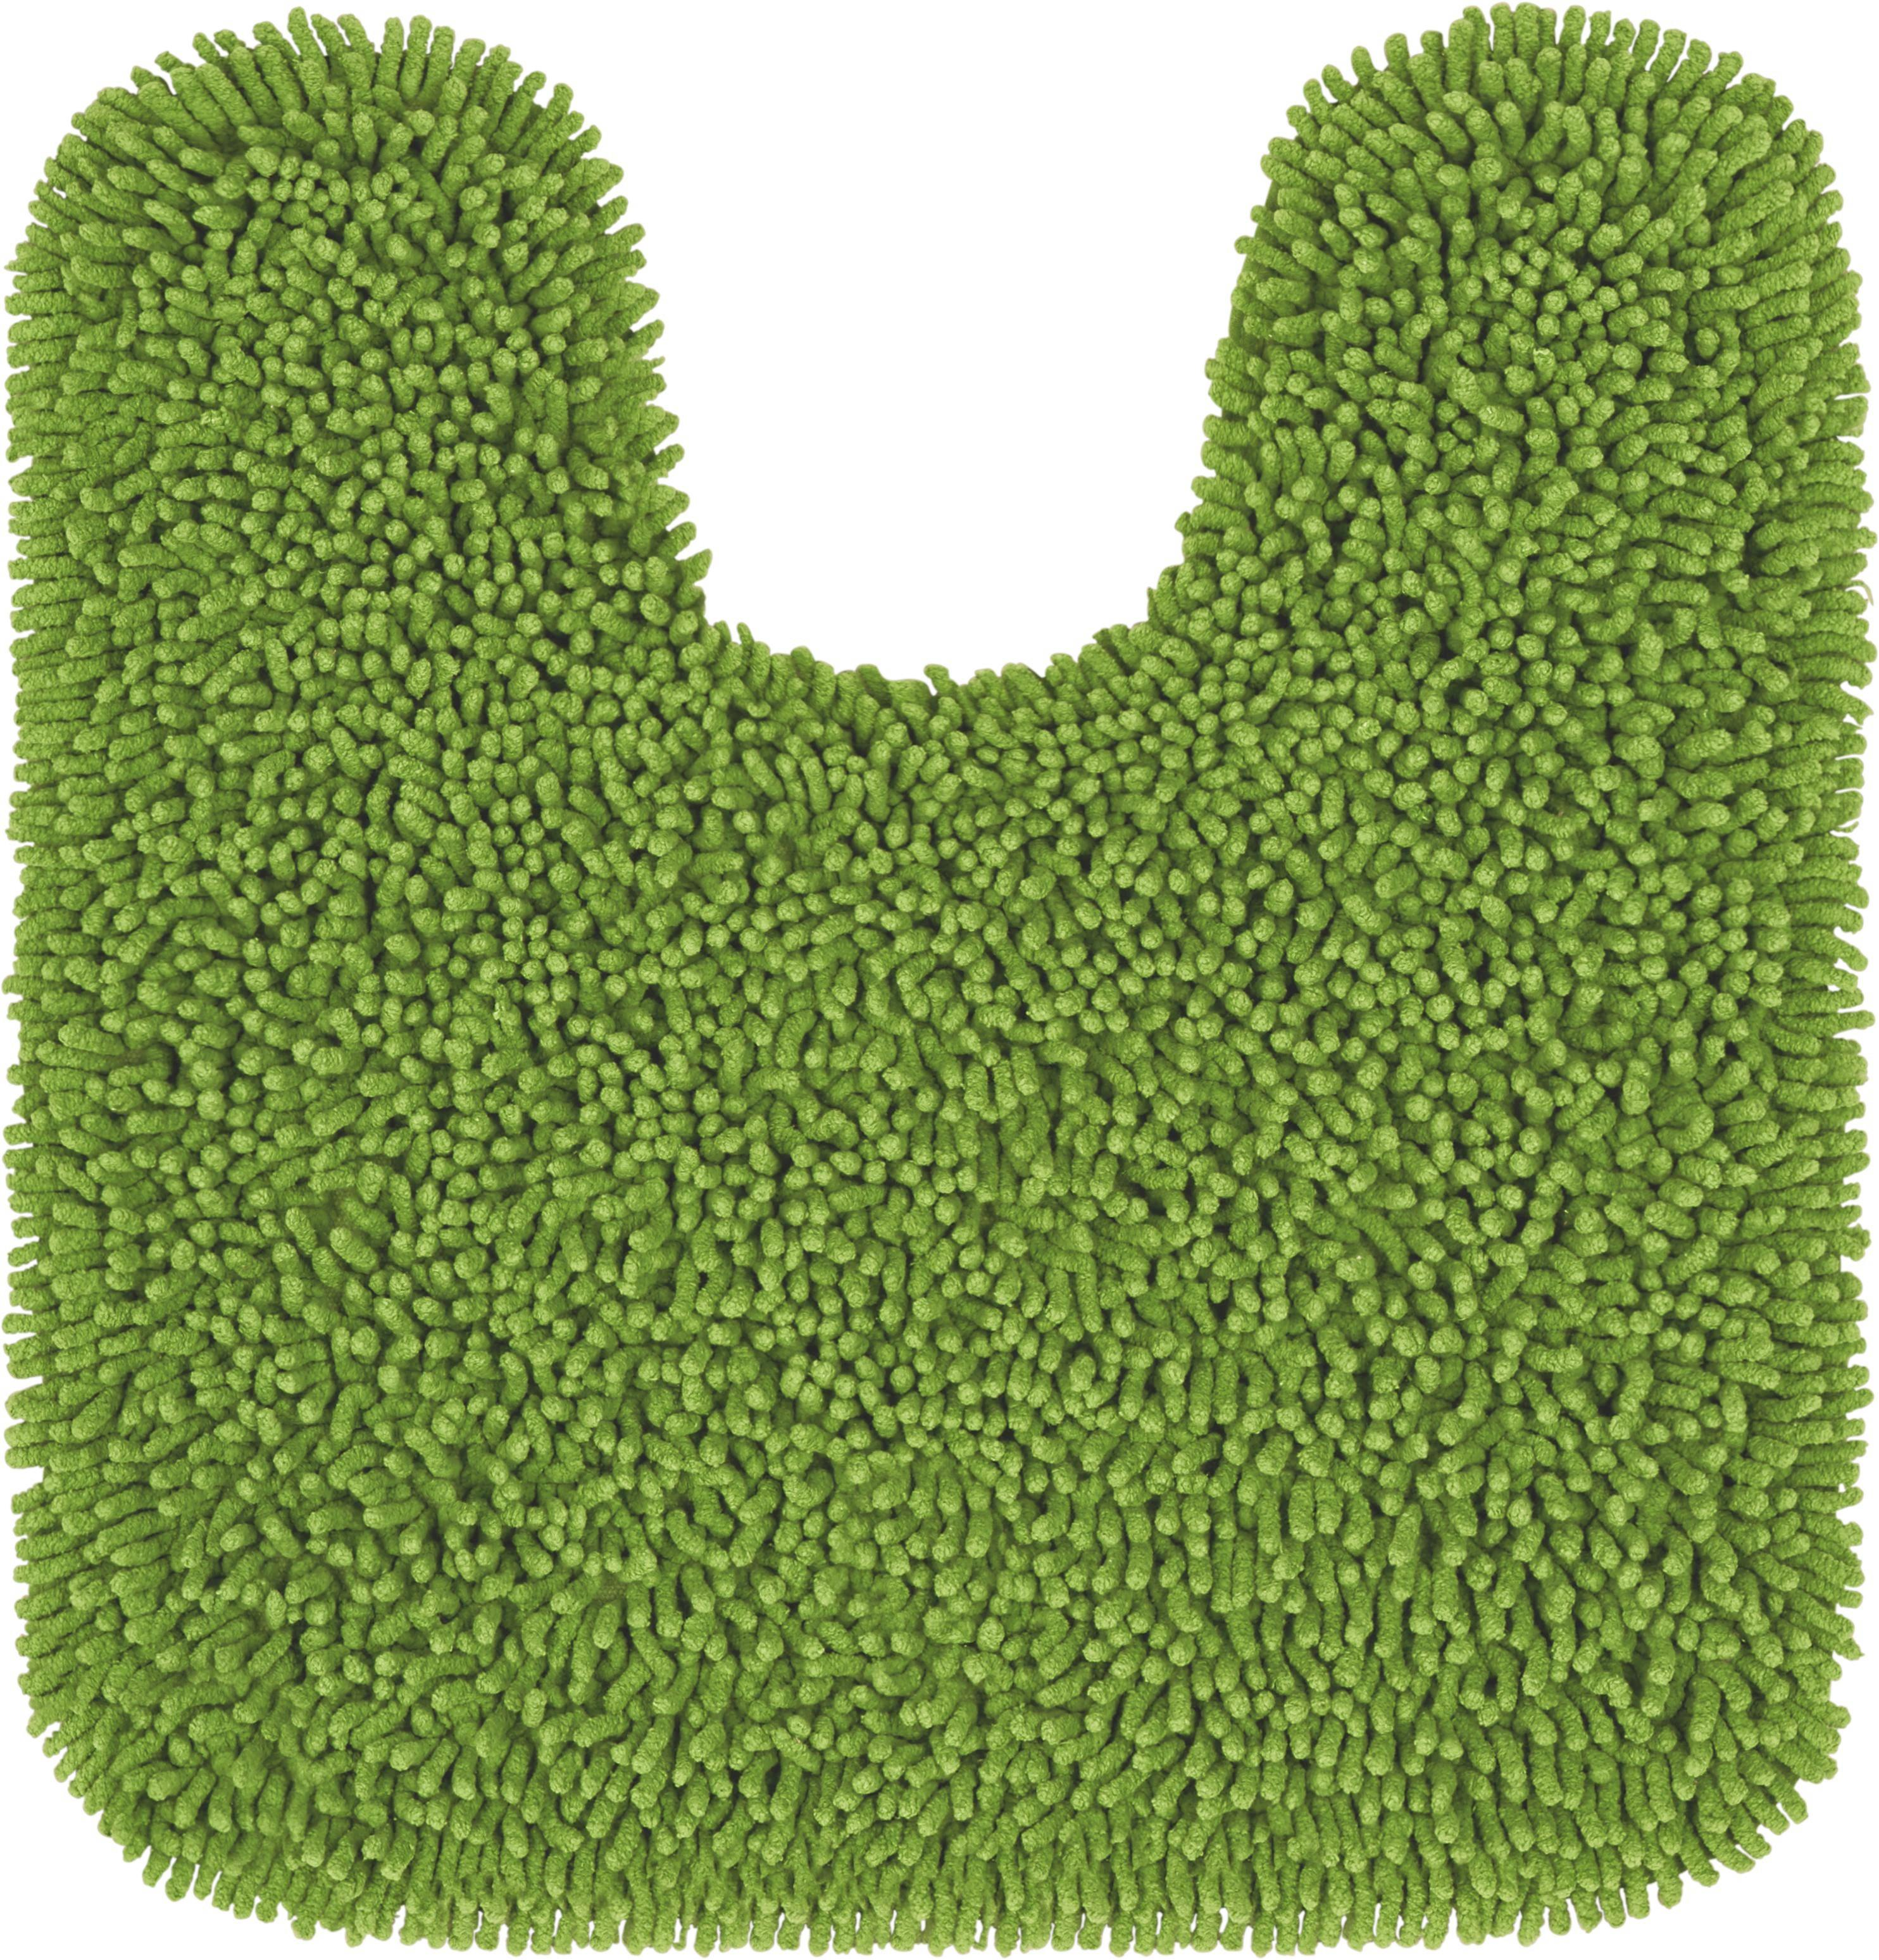 Wc-előke 100% Pamut - zöld, textil (55/55cm) - MÖMAX modern living